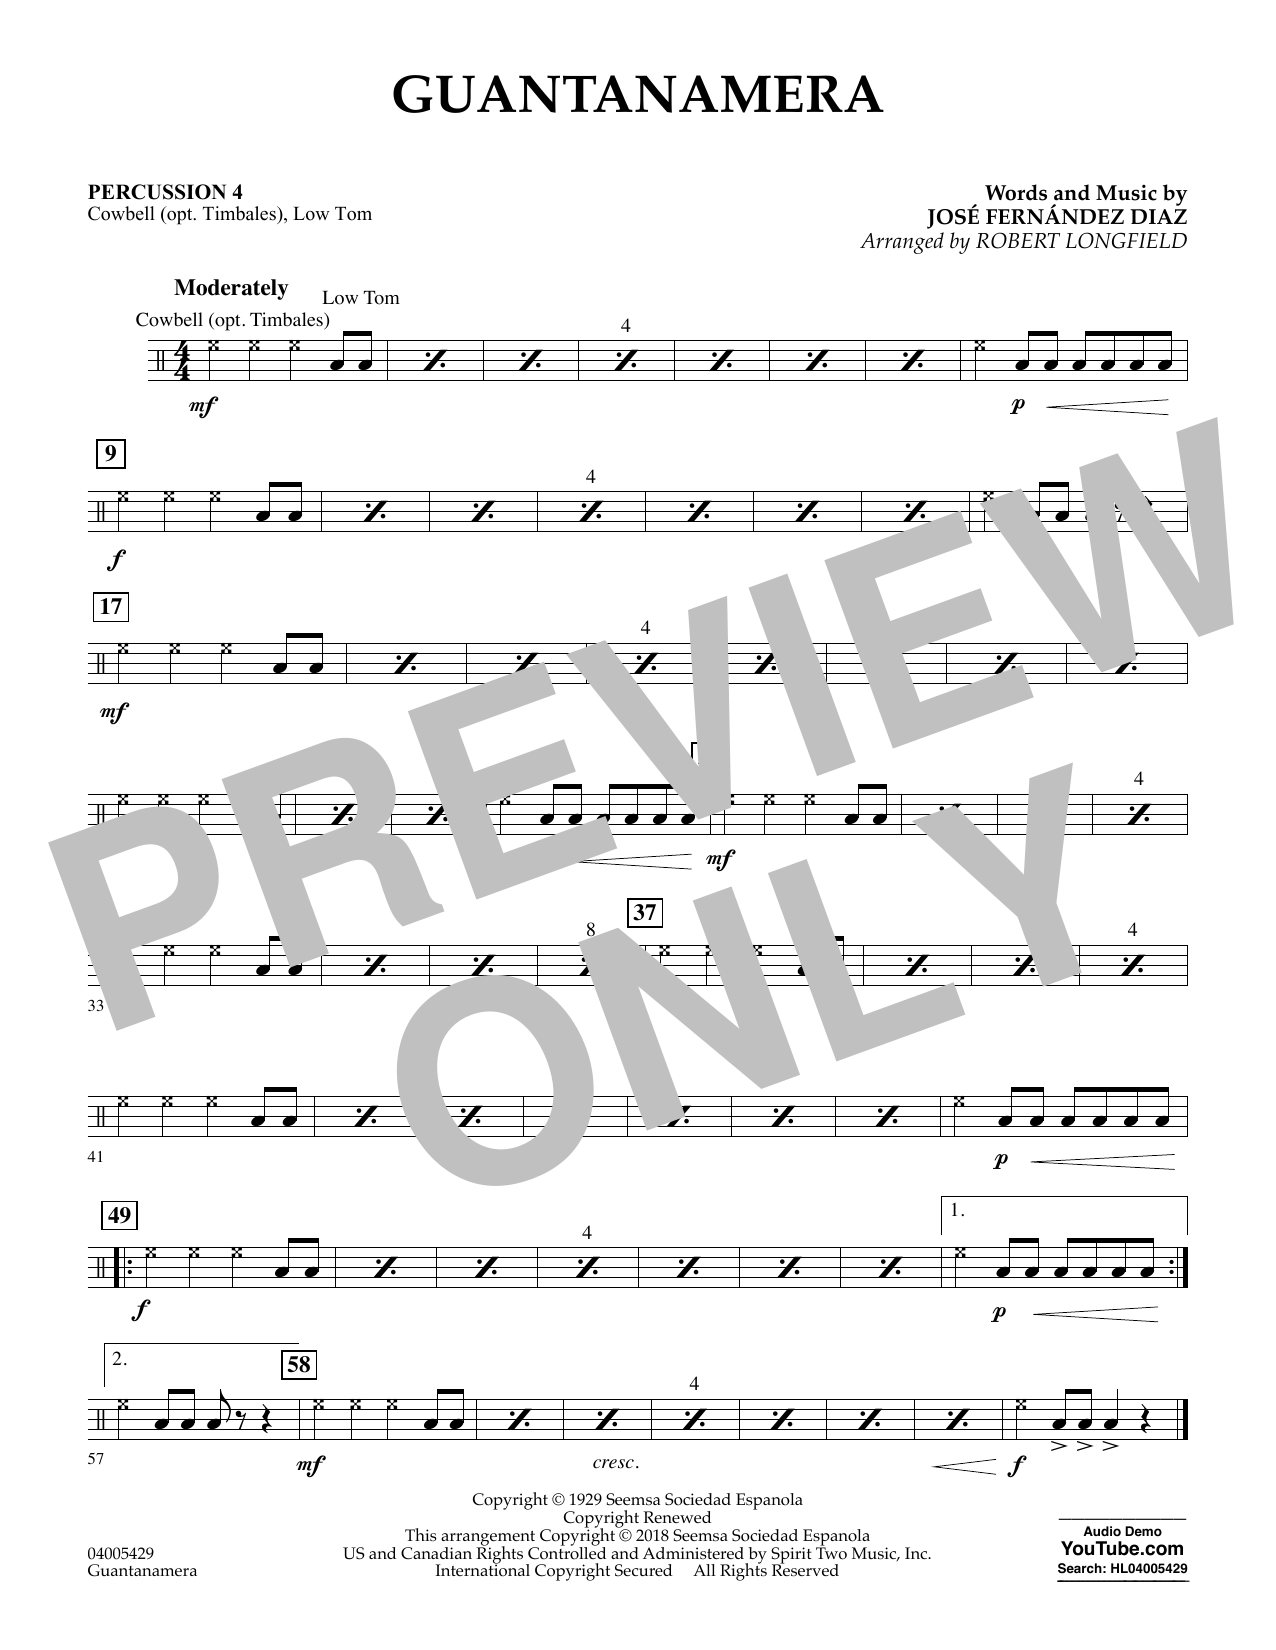 Guantanamera - Percussion 4 (Concert Band)